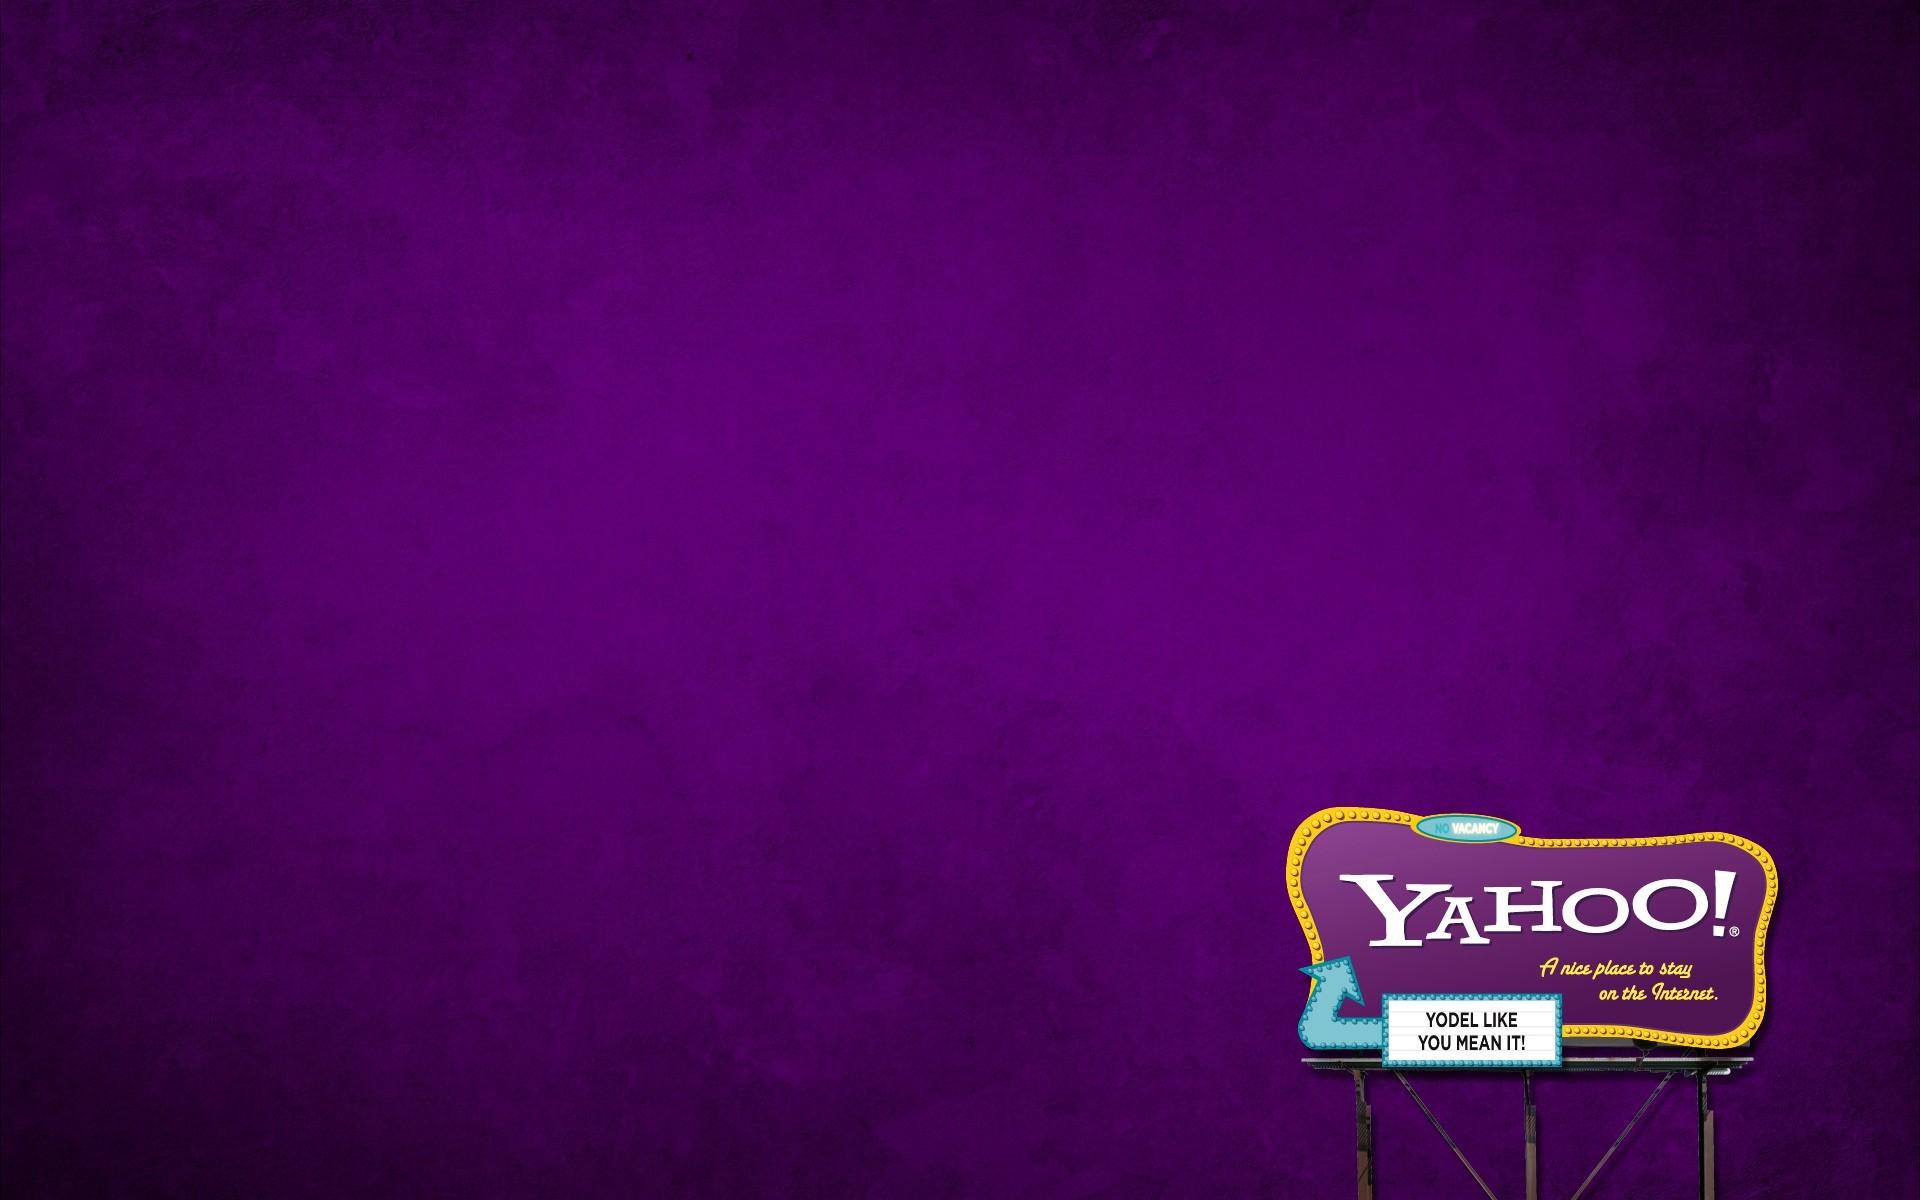 Yahoo Wallpaper (45+ images)